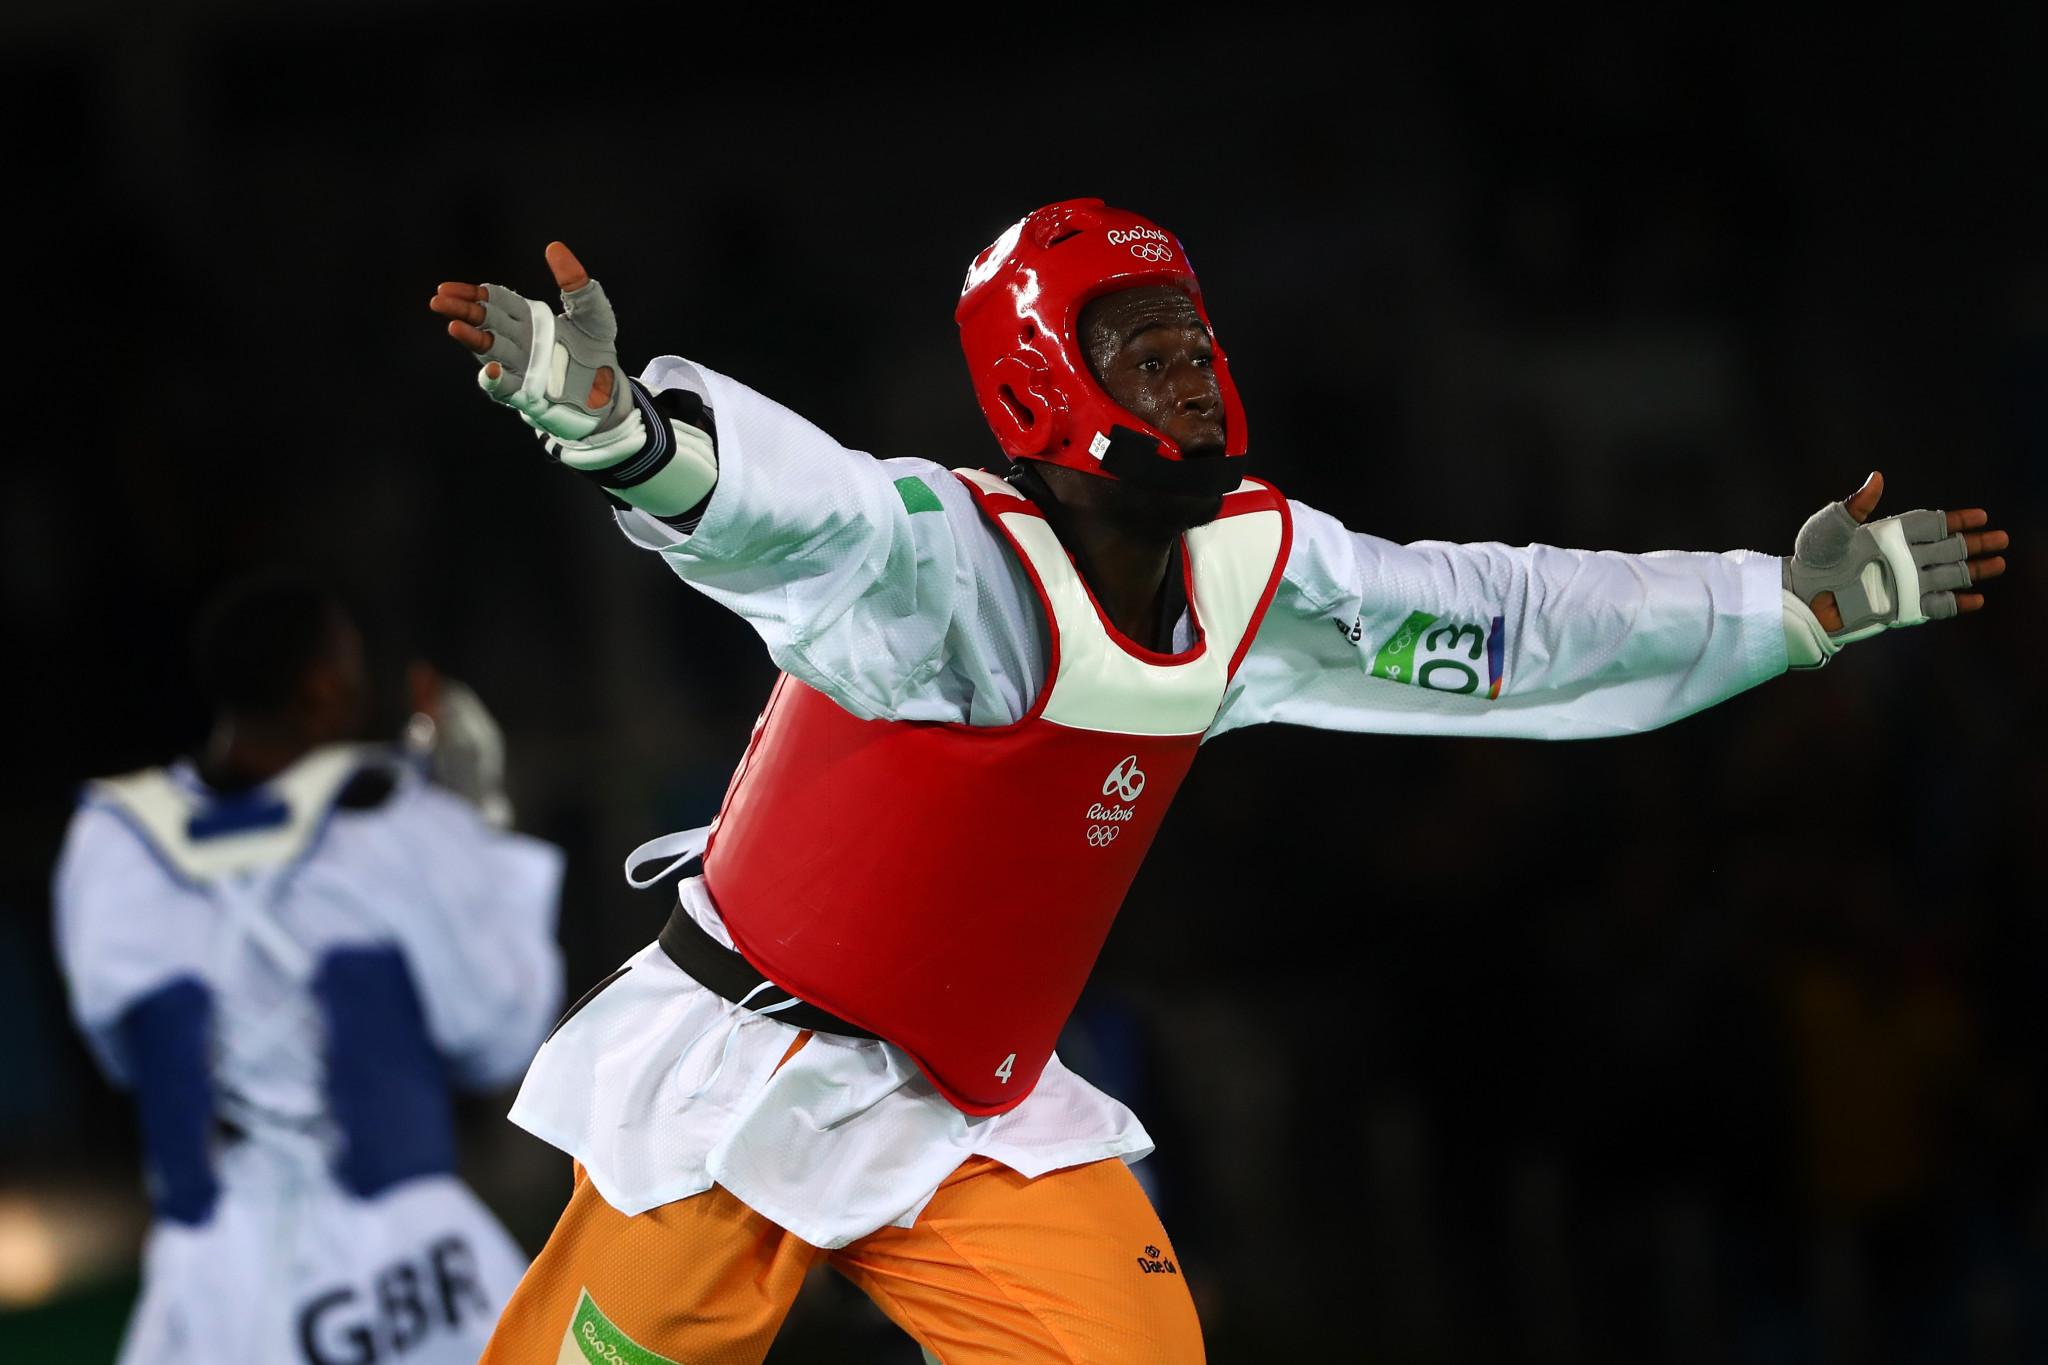 Olympic champion Cissé among winners at African Taekwondo Championships in Dakar